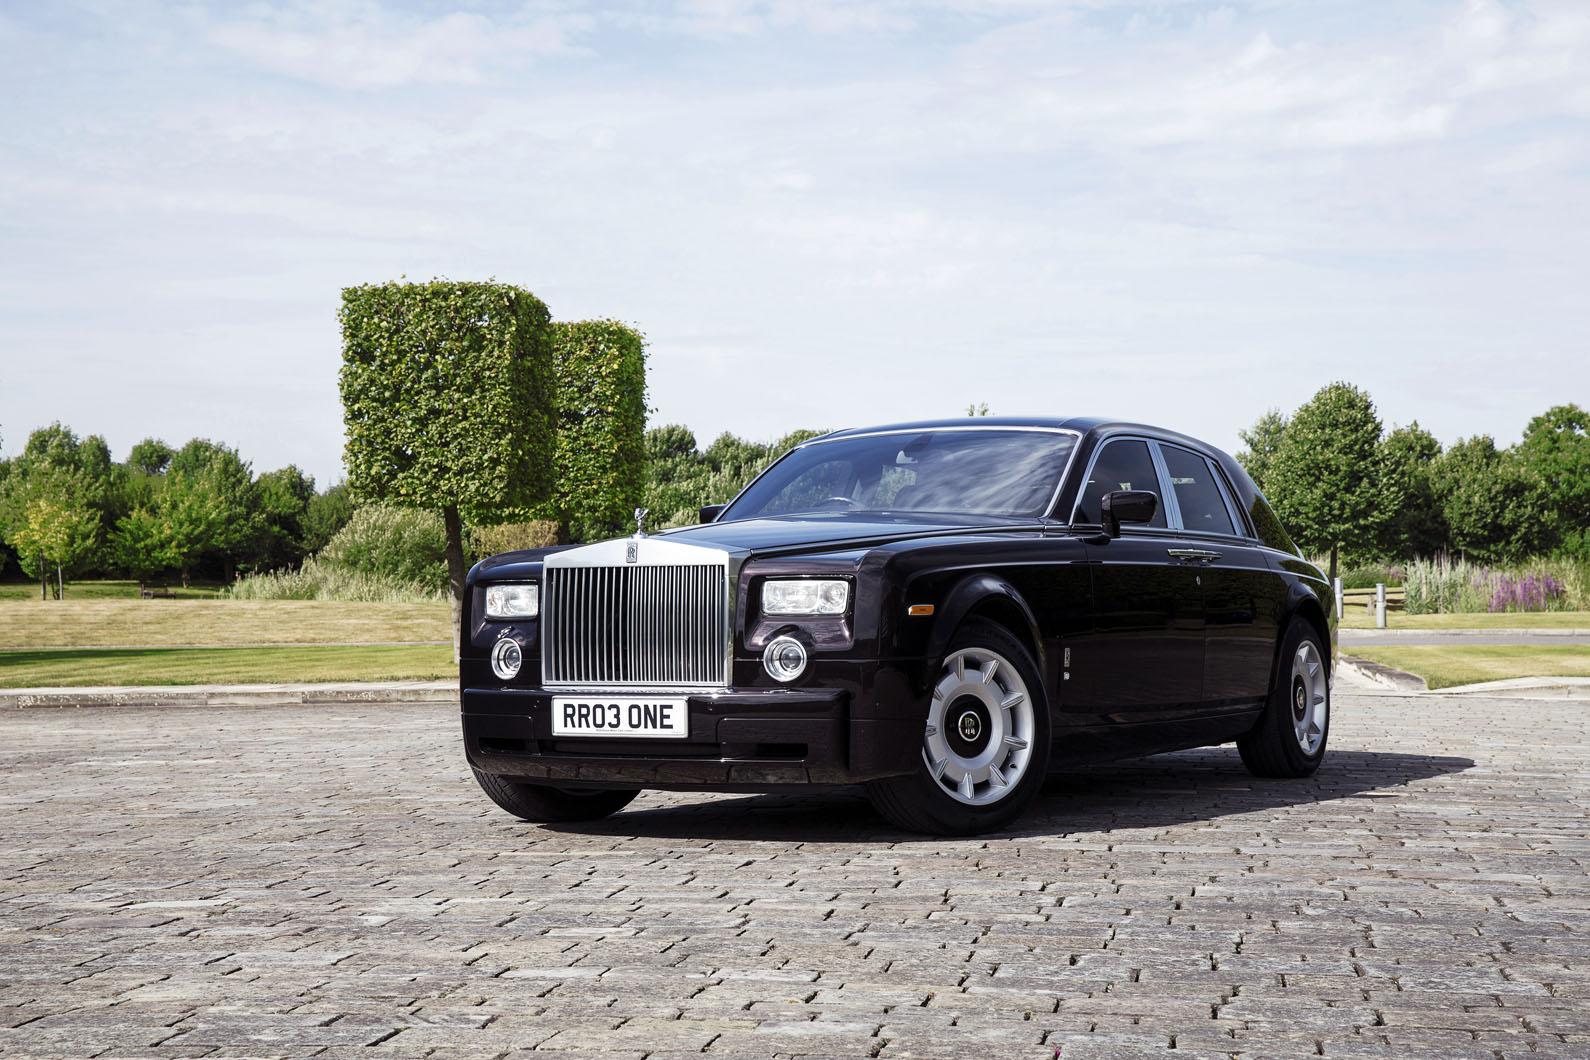 Rolls Royce Phantom Best Luxury Cars: Rolls-Royce Phantom: Eight Generations Of Luxury